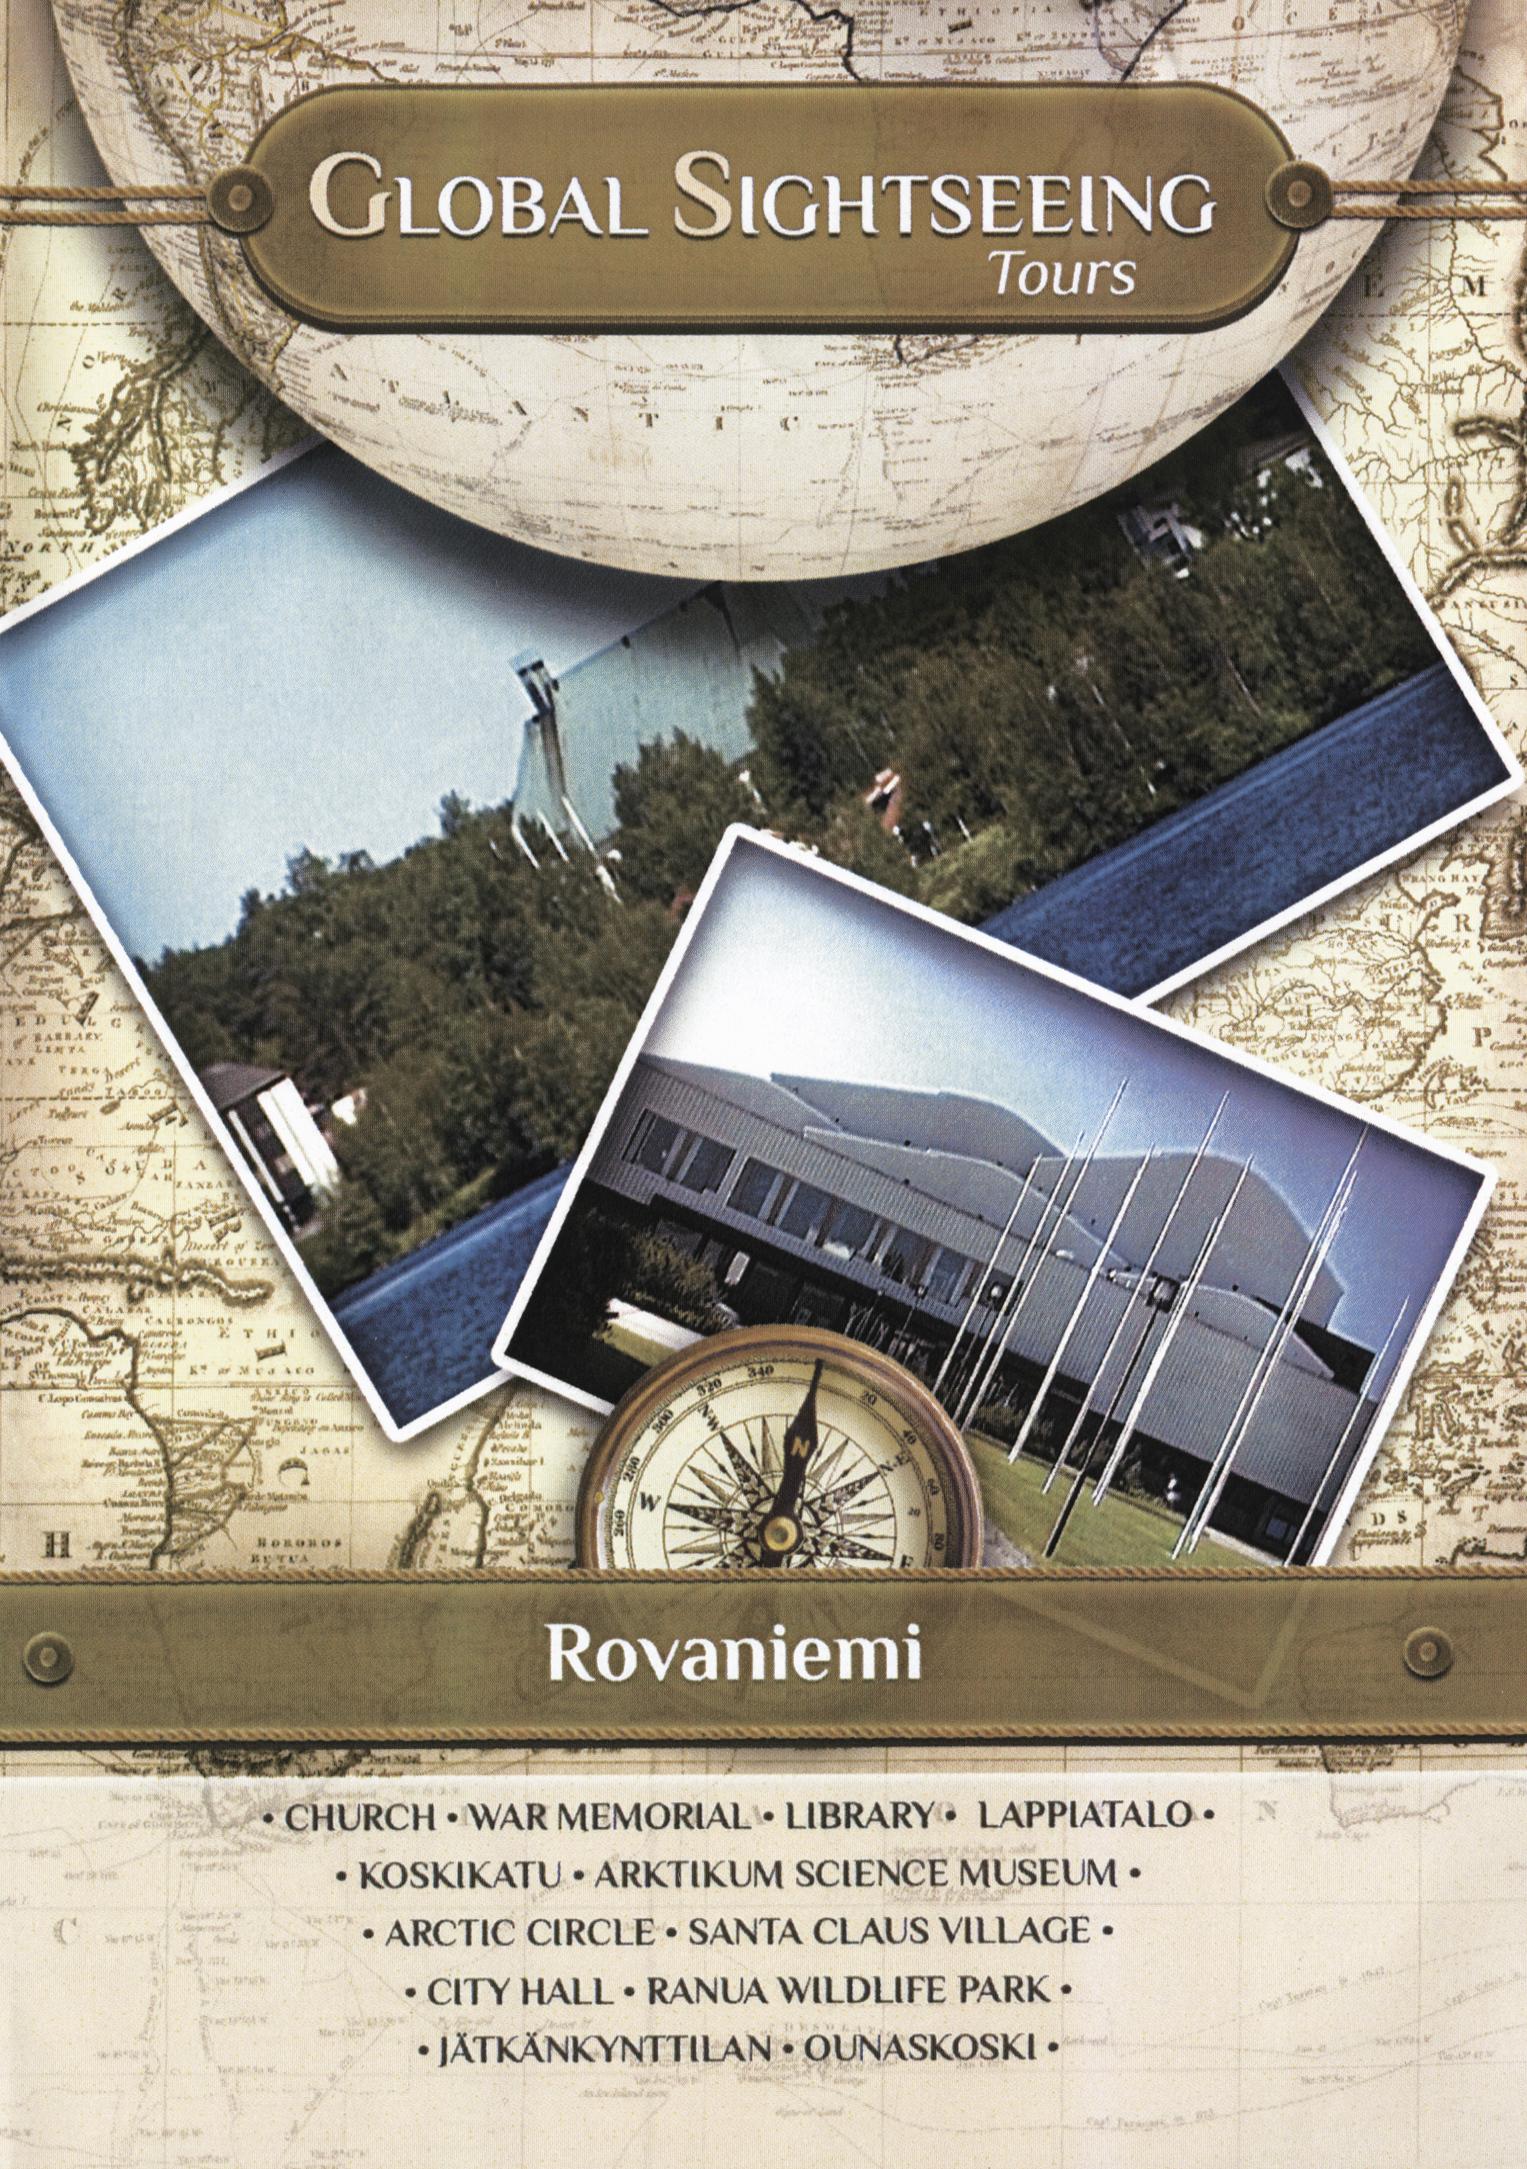 Global Sightseeing Tours: Rovaniemi